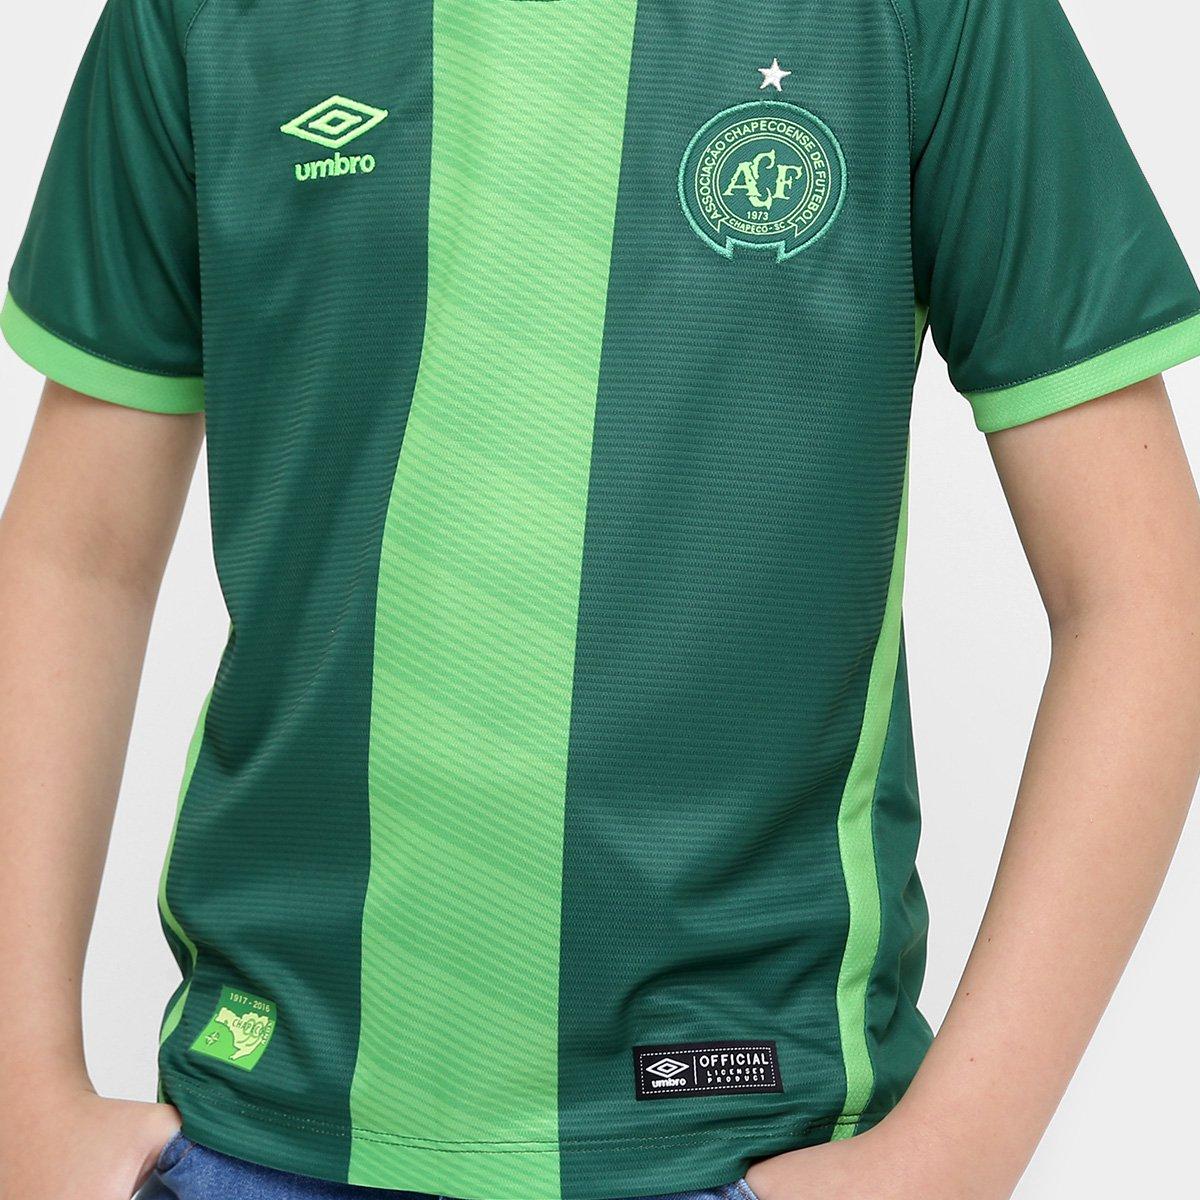 Torcedor Umbro III 17 Masculino Juvenil nº10 Chapecoense Verde Camisa 16 Enwqx04YI6